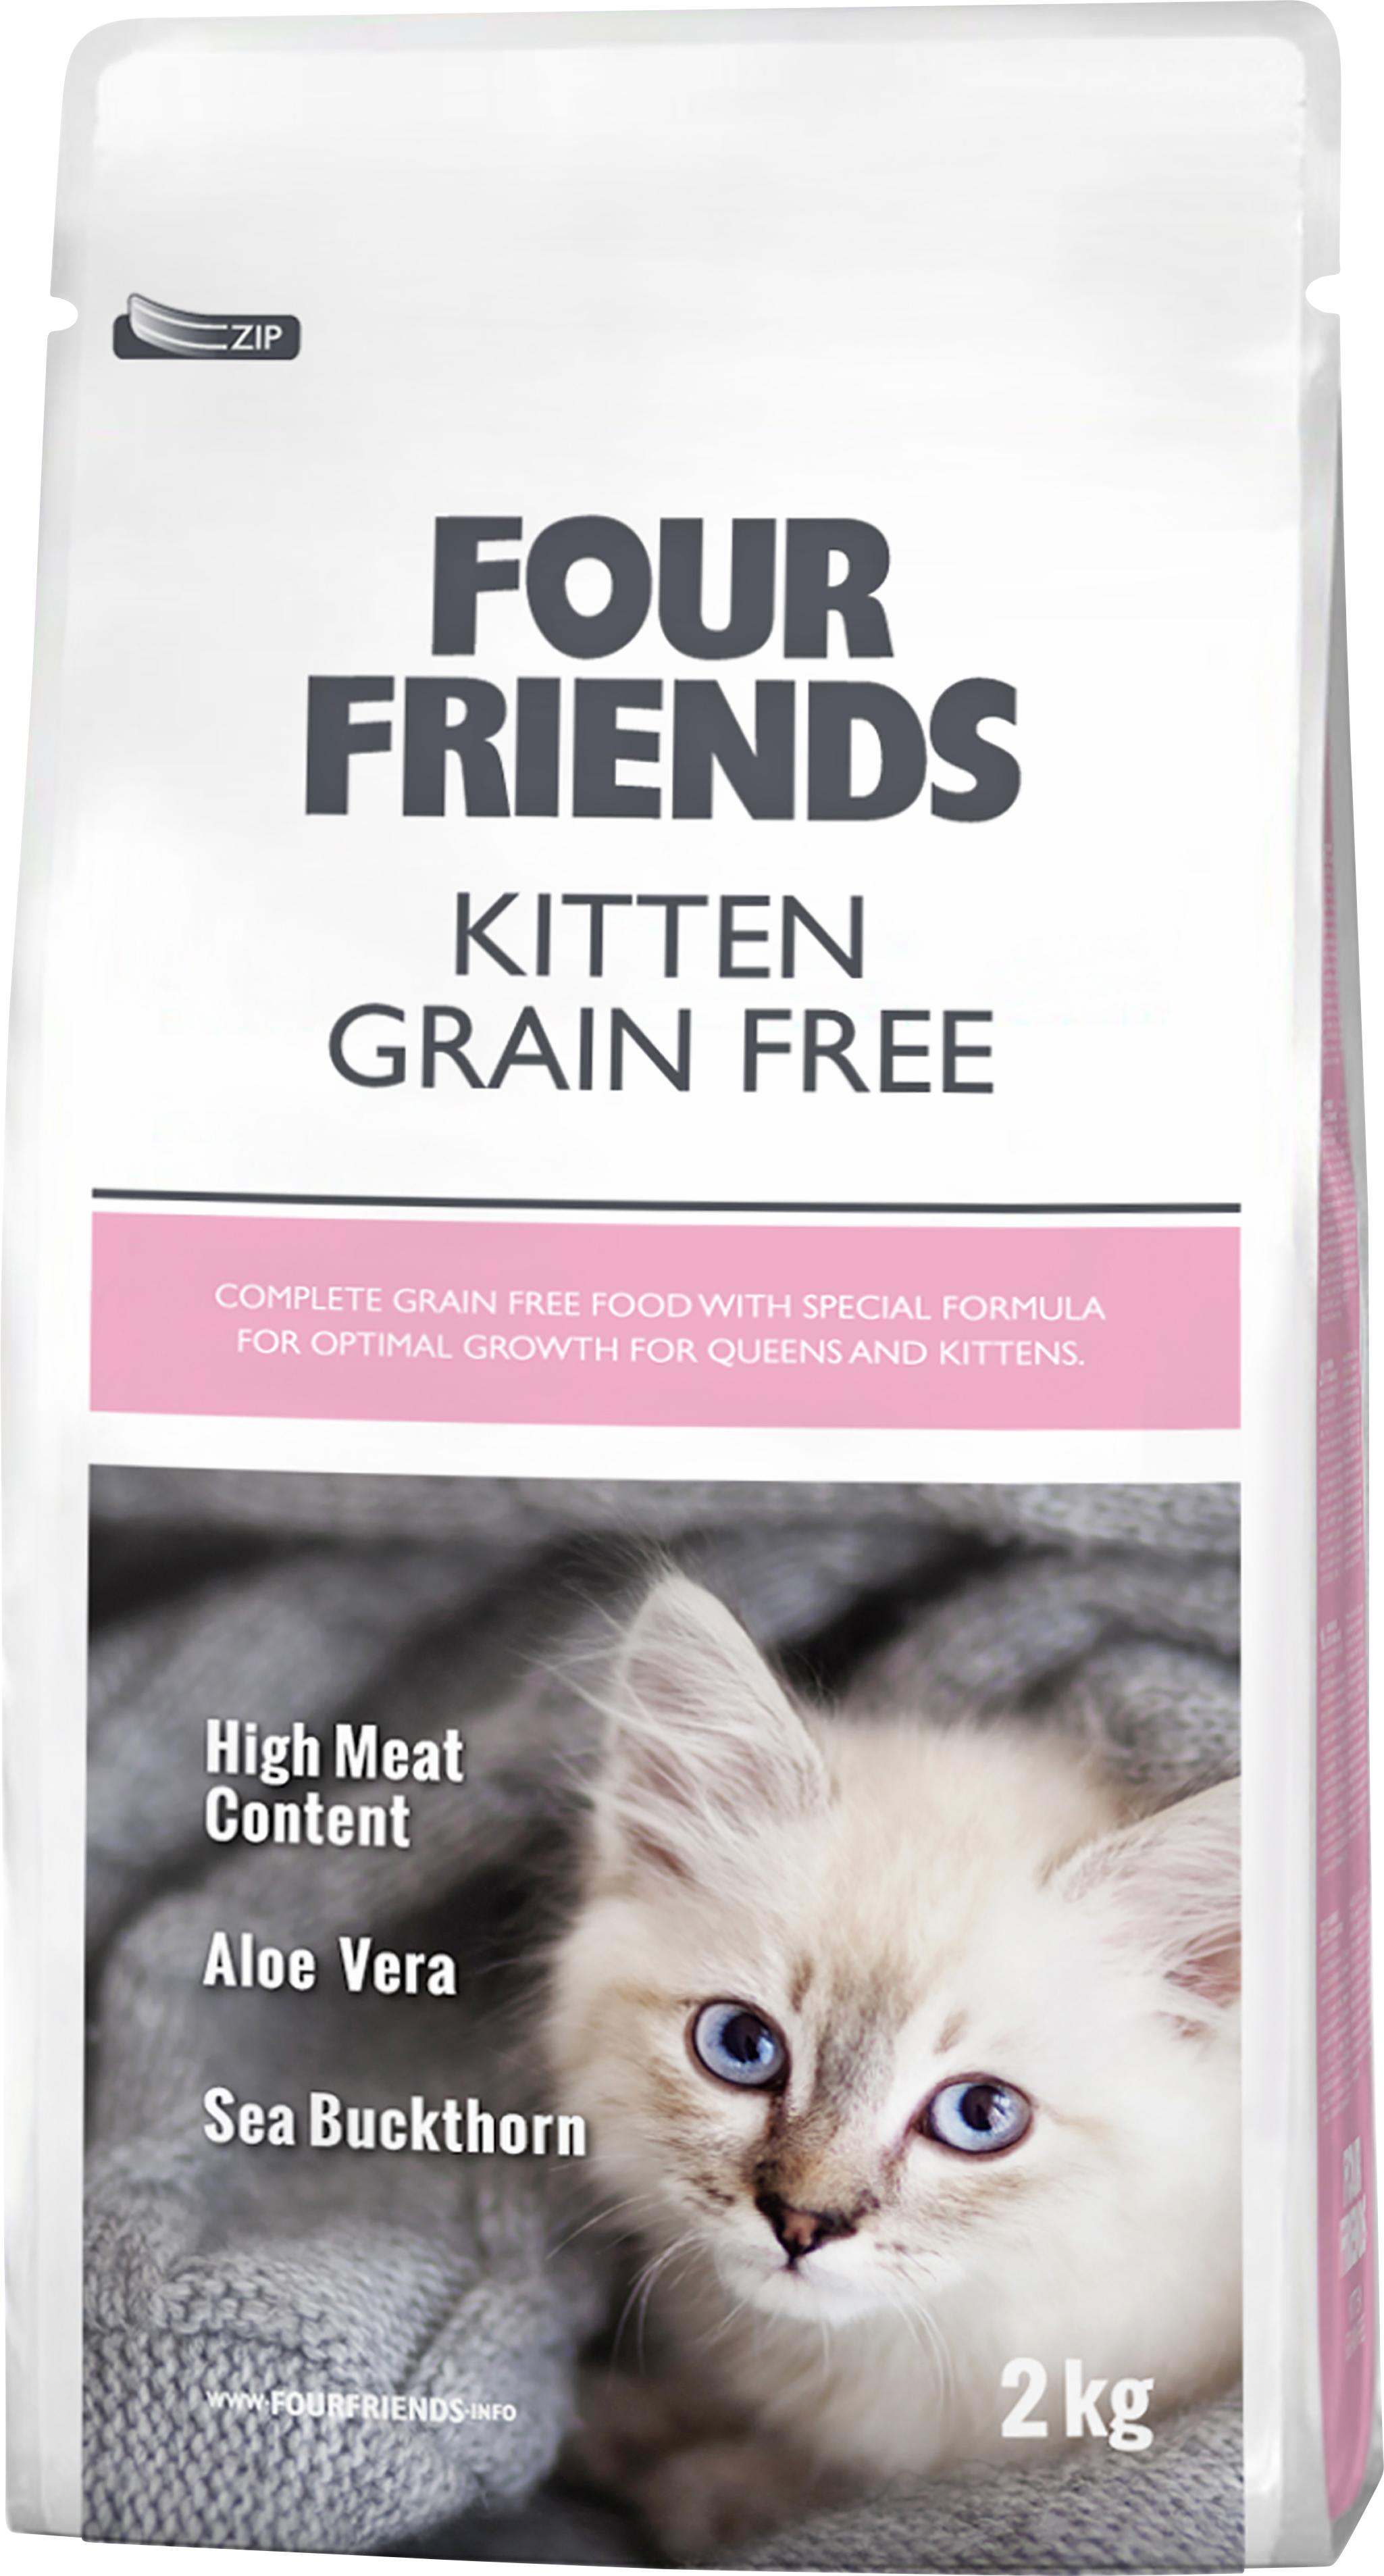 Kattmat Four Friends Grain Free Kitten, 2 kg